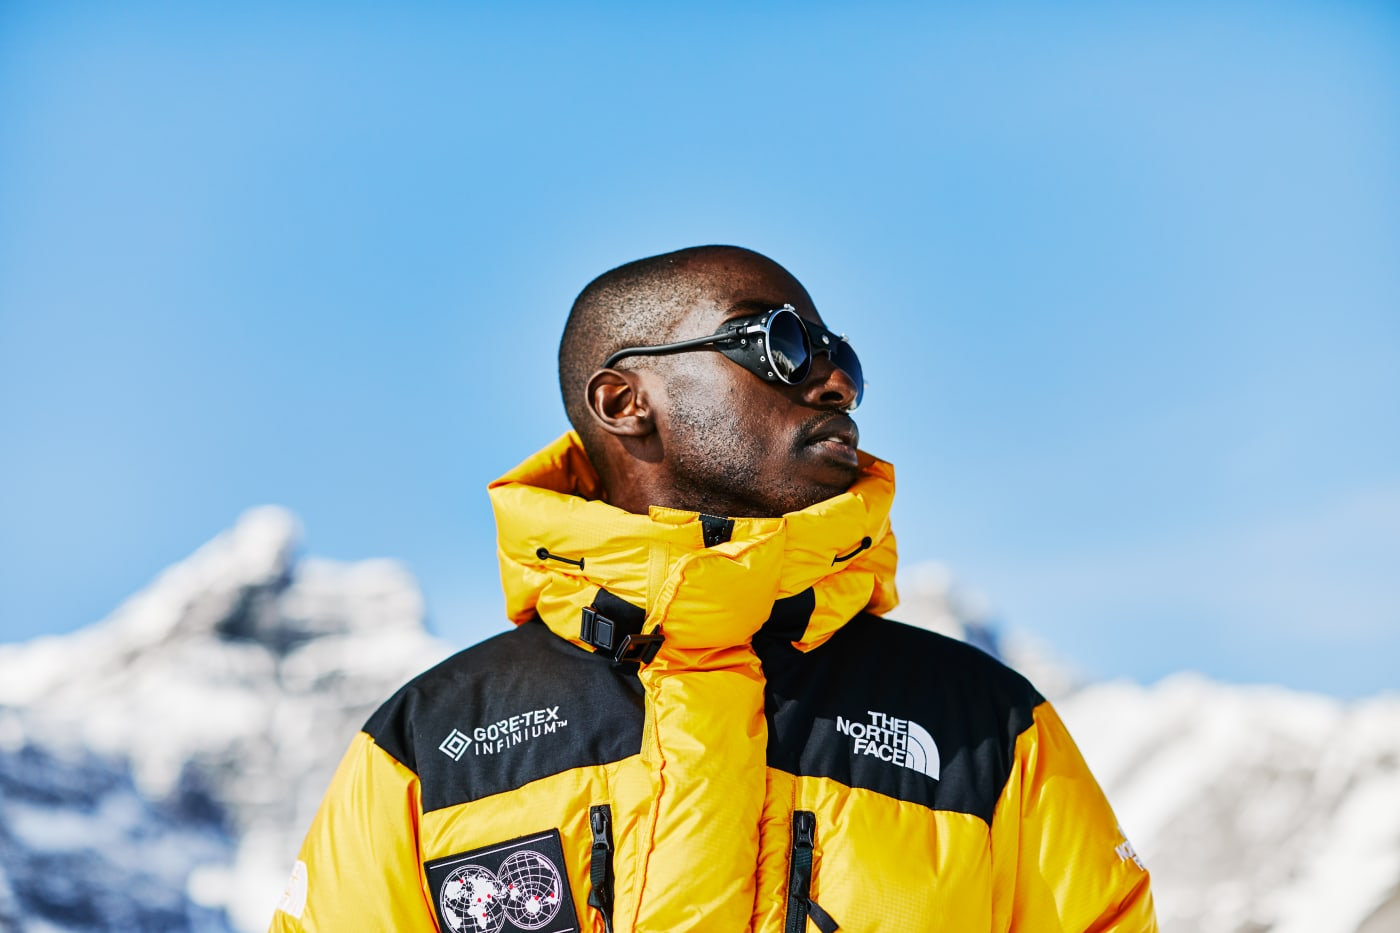 north face 7 summits